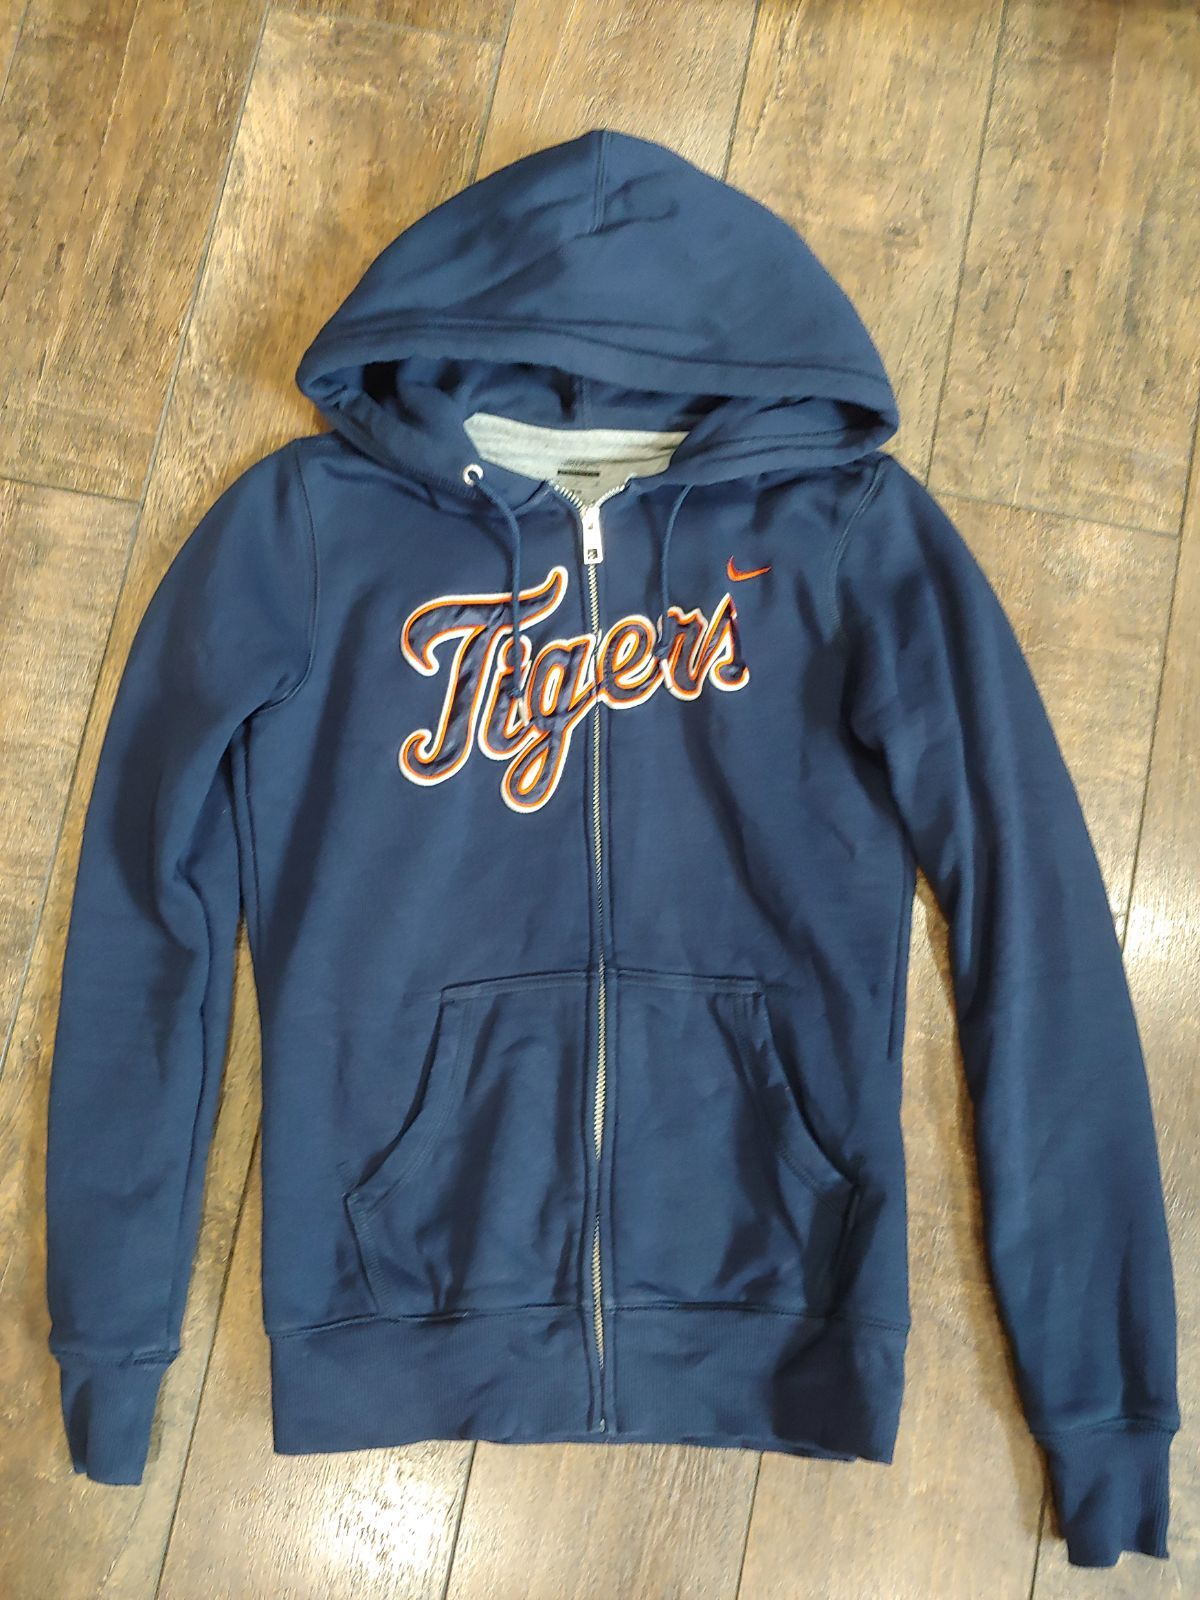 Nike Detroit Tigers Sweatshirt On Mercari Tiger Sweatshirt Sweatshirts Hoodies Womens [ 1600 x 1200 Pixel ]